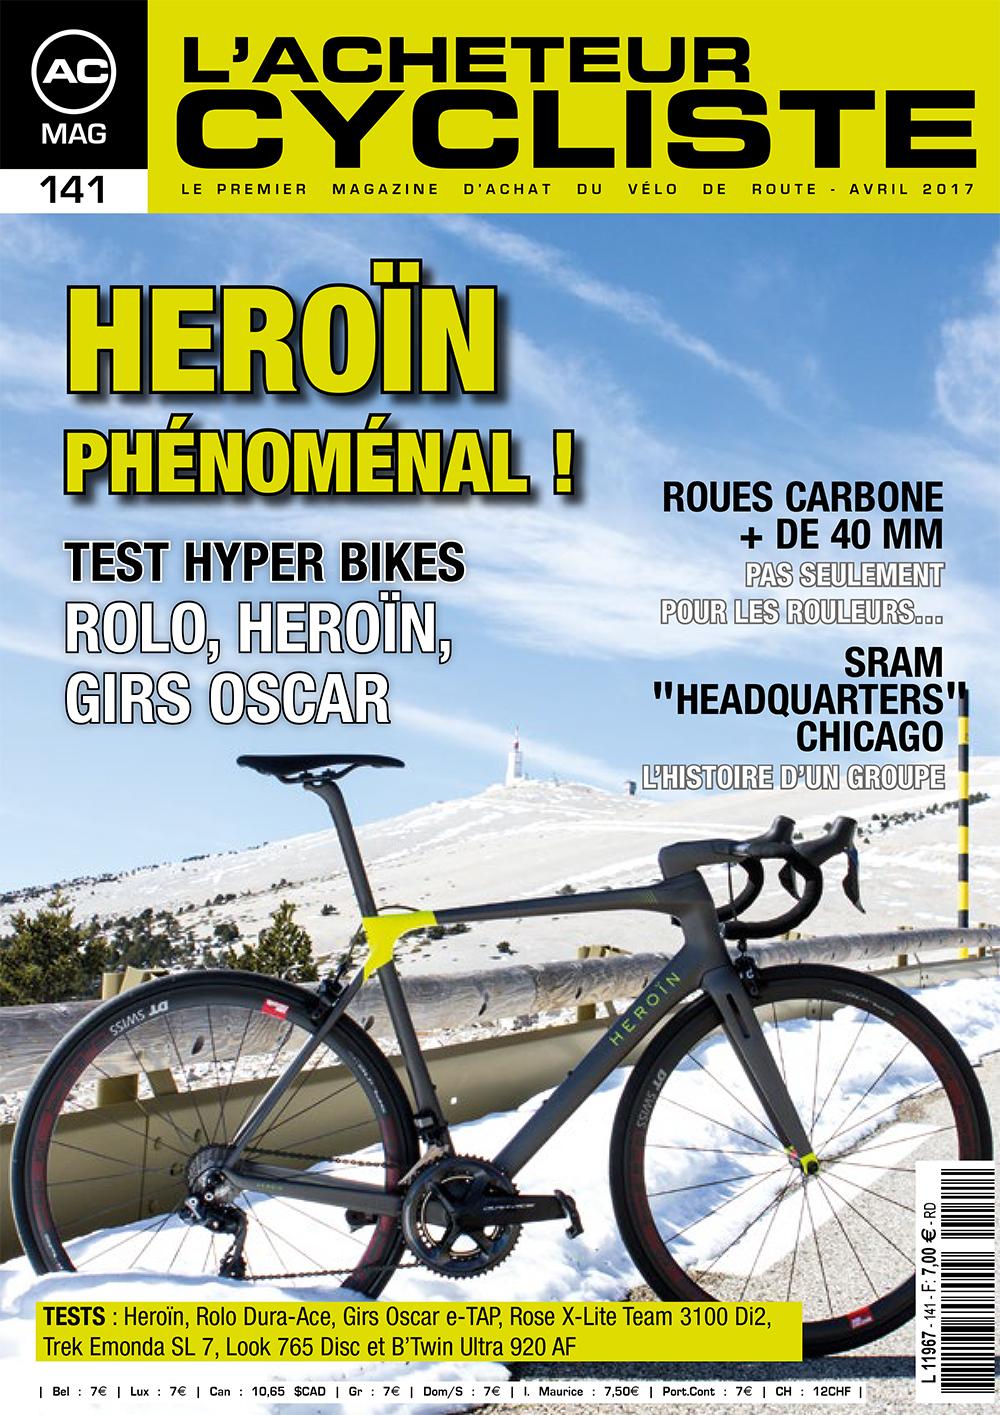 up-cycling-remi-chenu-experience-expert-velo-marketin-presse-test1